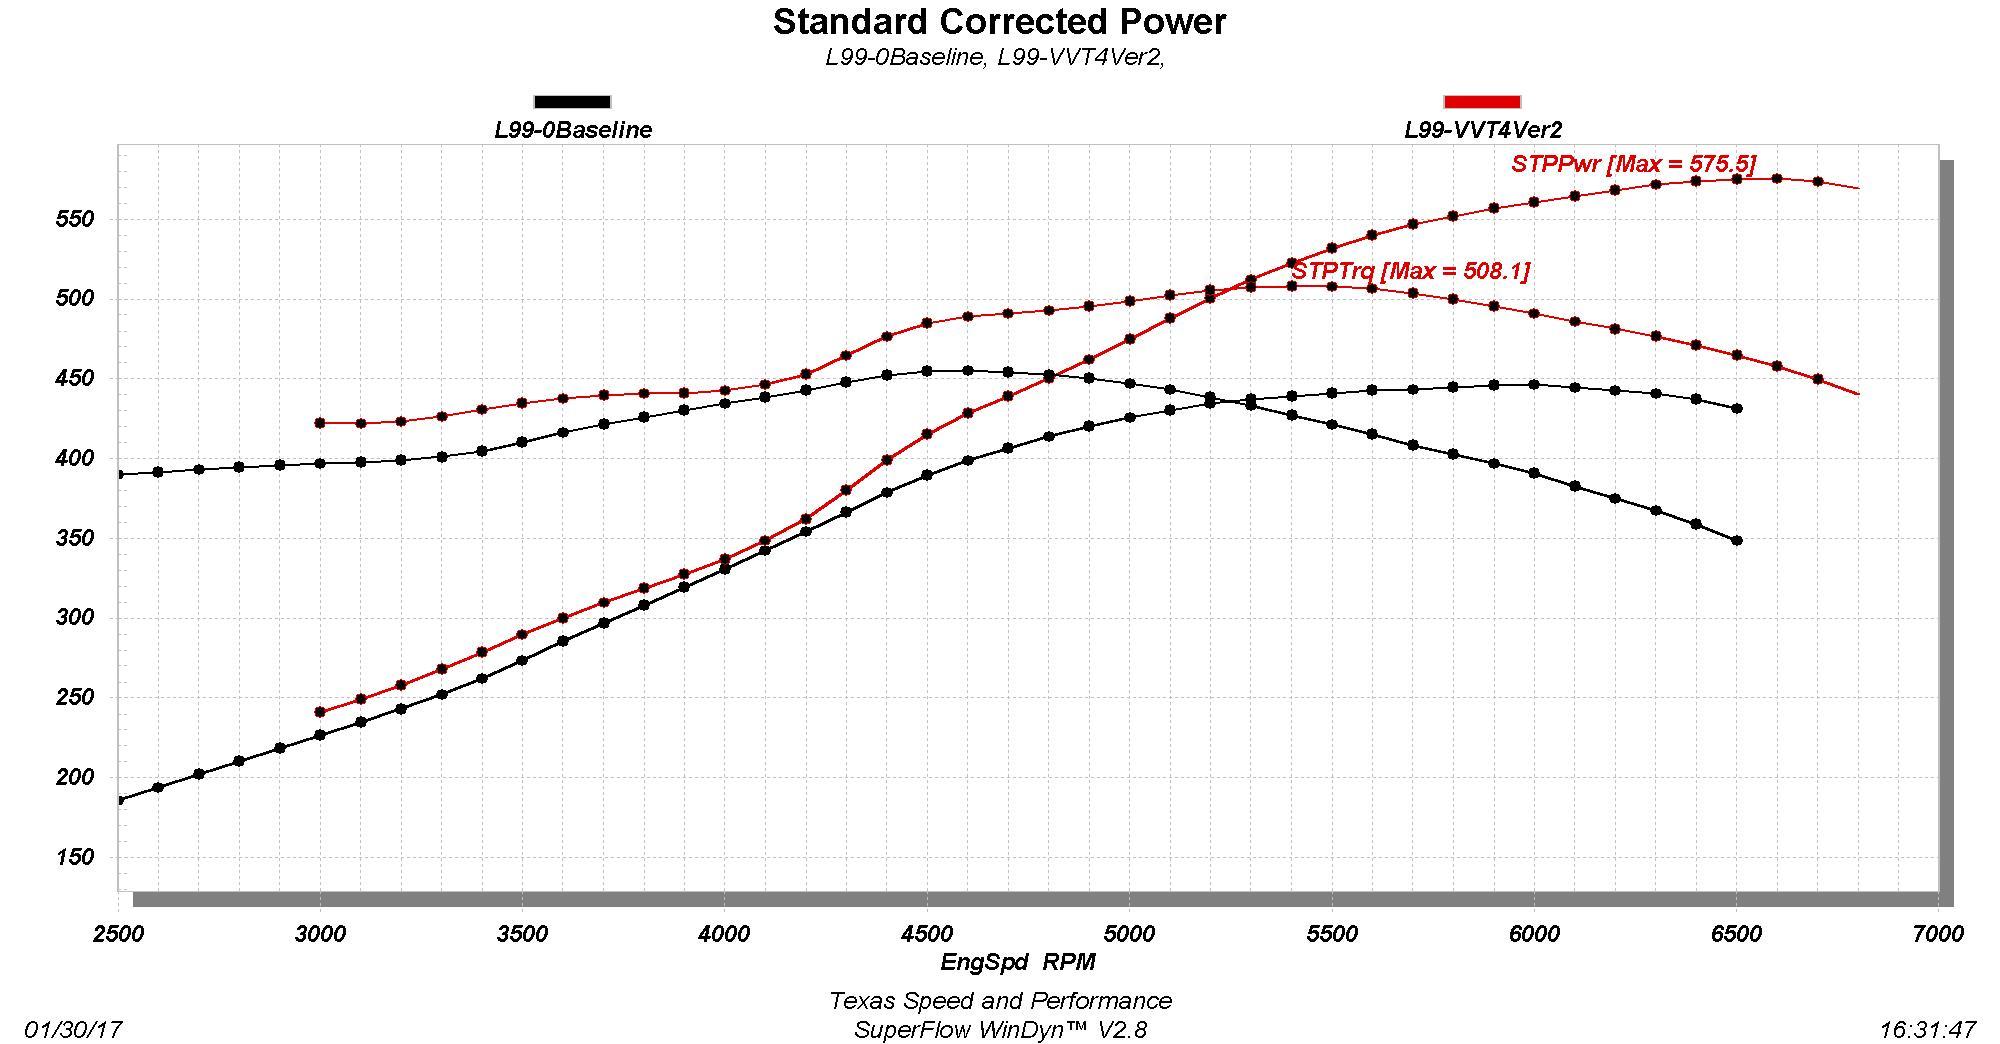 New Texas Speed Stage 4 Vvt 42 L99 Camshaft 2009 Silverado With Afm Engine Diagram 41900